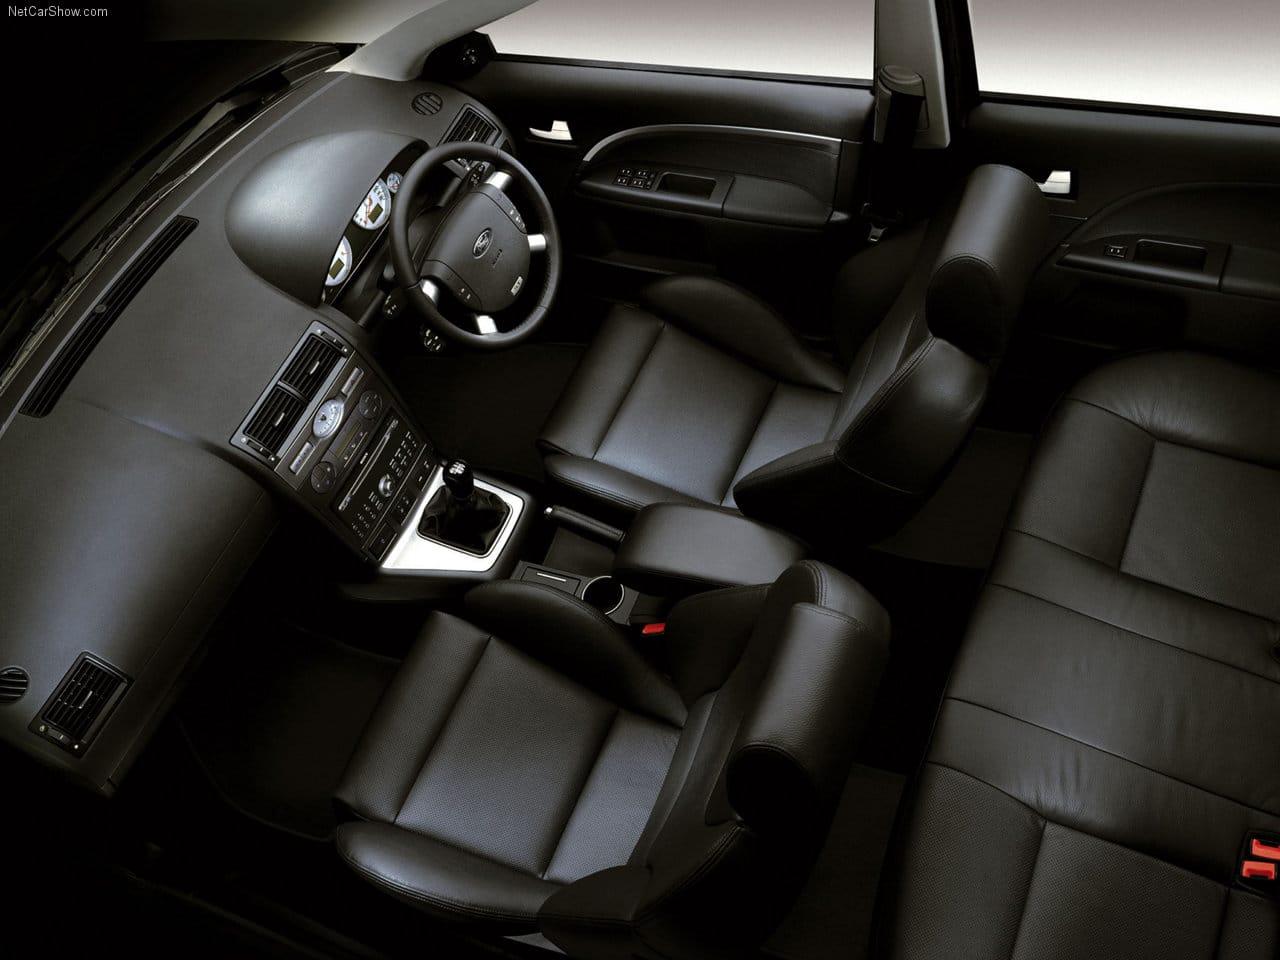 Ford Mondeo ST220, Ford Mondeo, Mondeo, Mondeo ST220, V6, performance ford, fast ford, 3.0, btcc, jonothan palmer, motoring, automotive, car, cars, classic car, retro car, ebay motors, autotrader